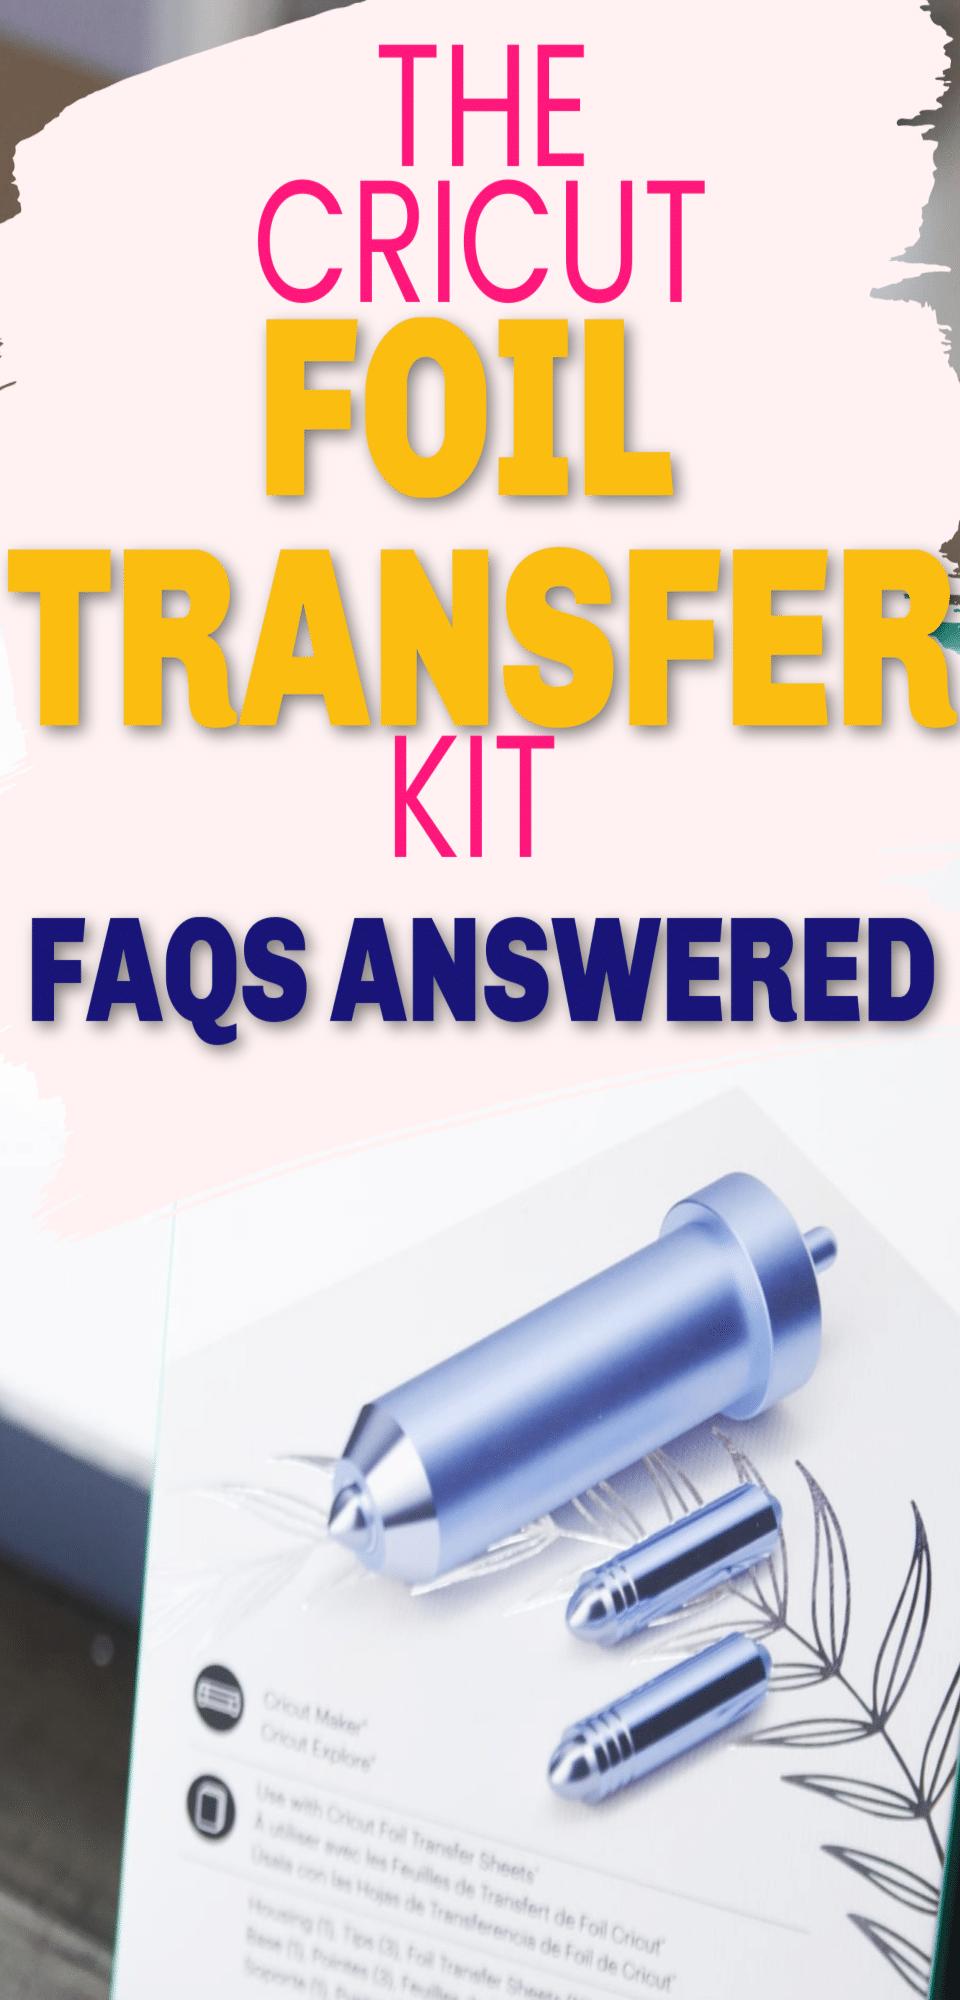 Cricut Foil Transfer Tool: FAQs Answered! via @clarkscondensed